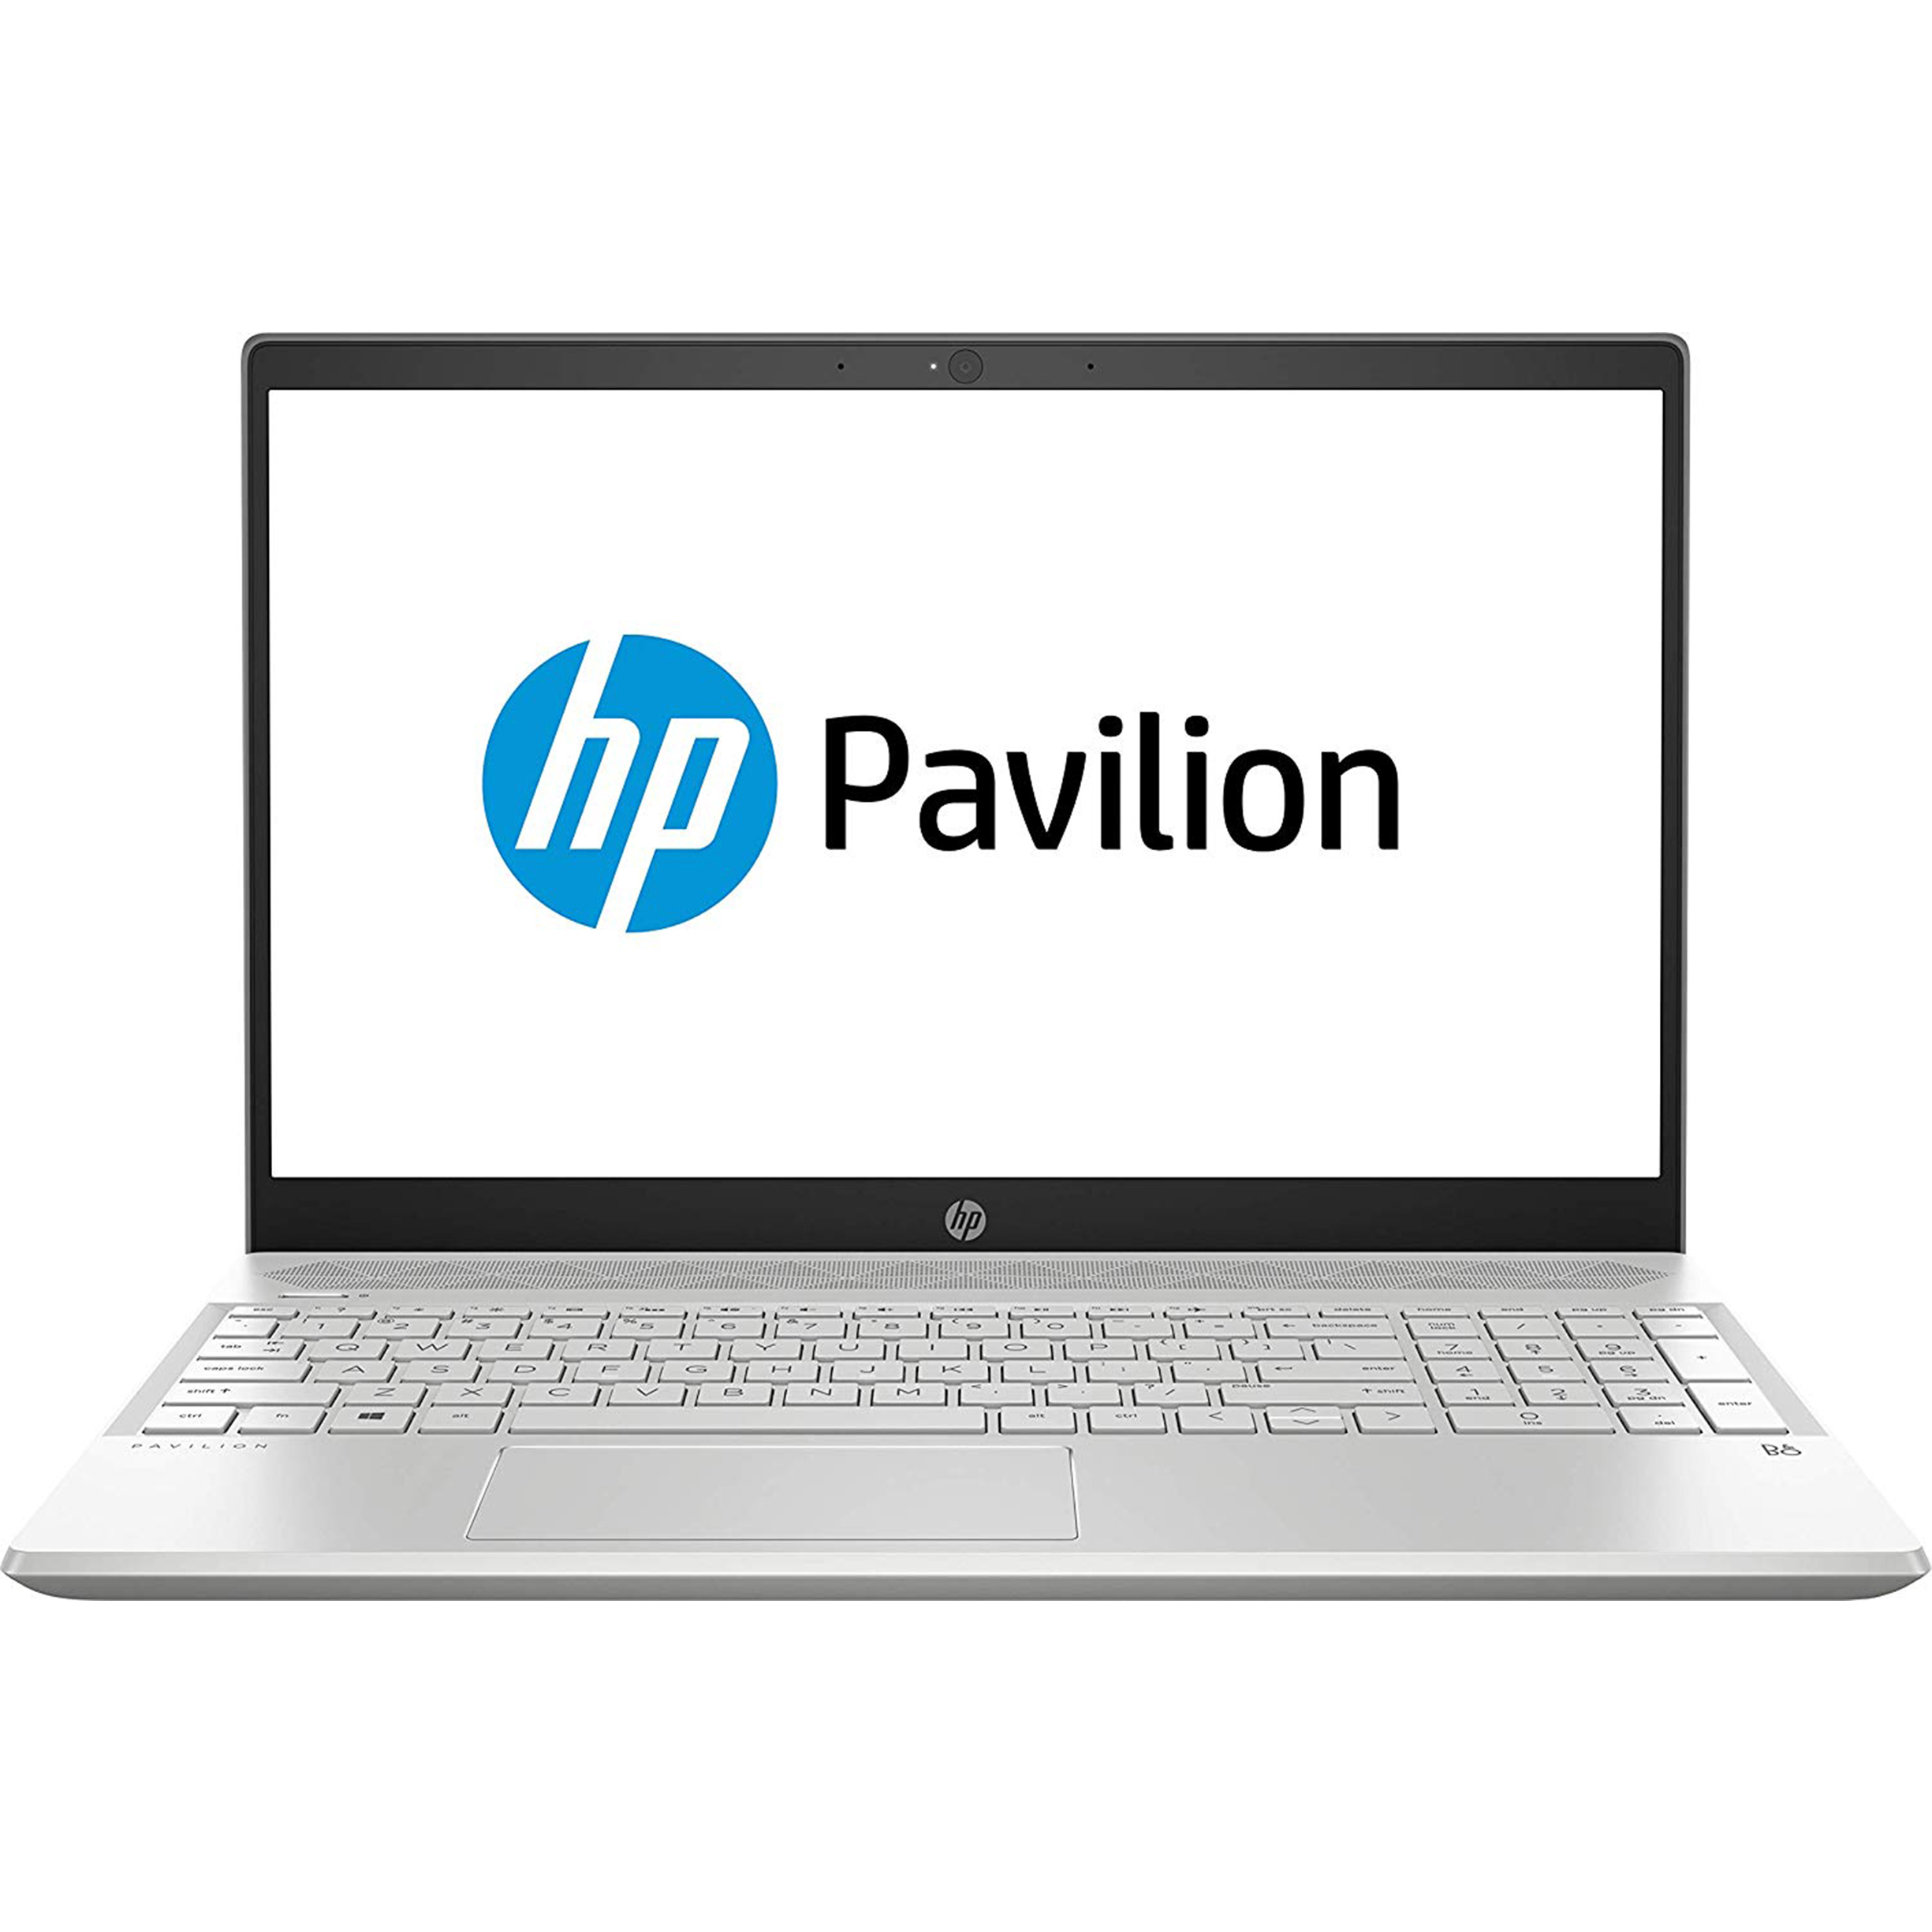 لپ تاپ 15 اینچی اچ پی مدل Pavilion CS1000-G